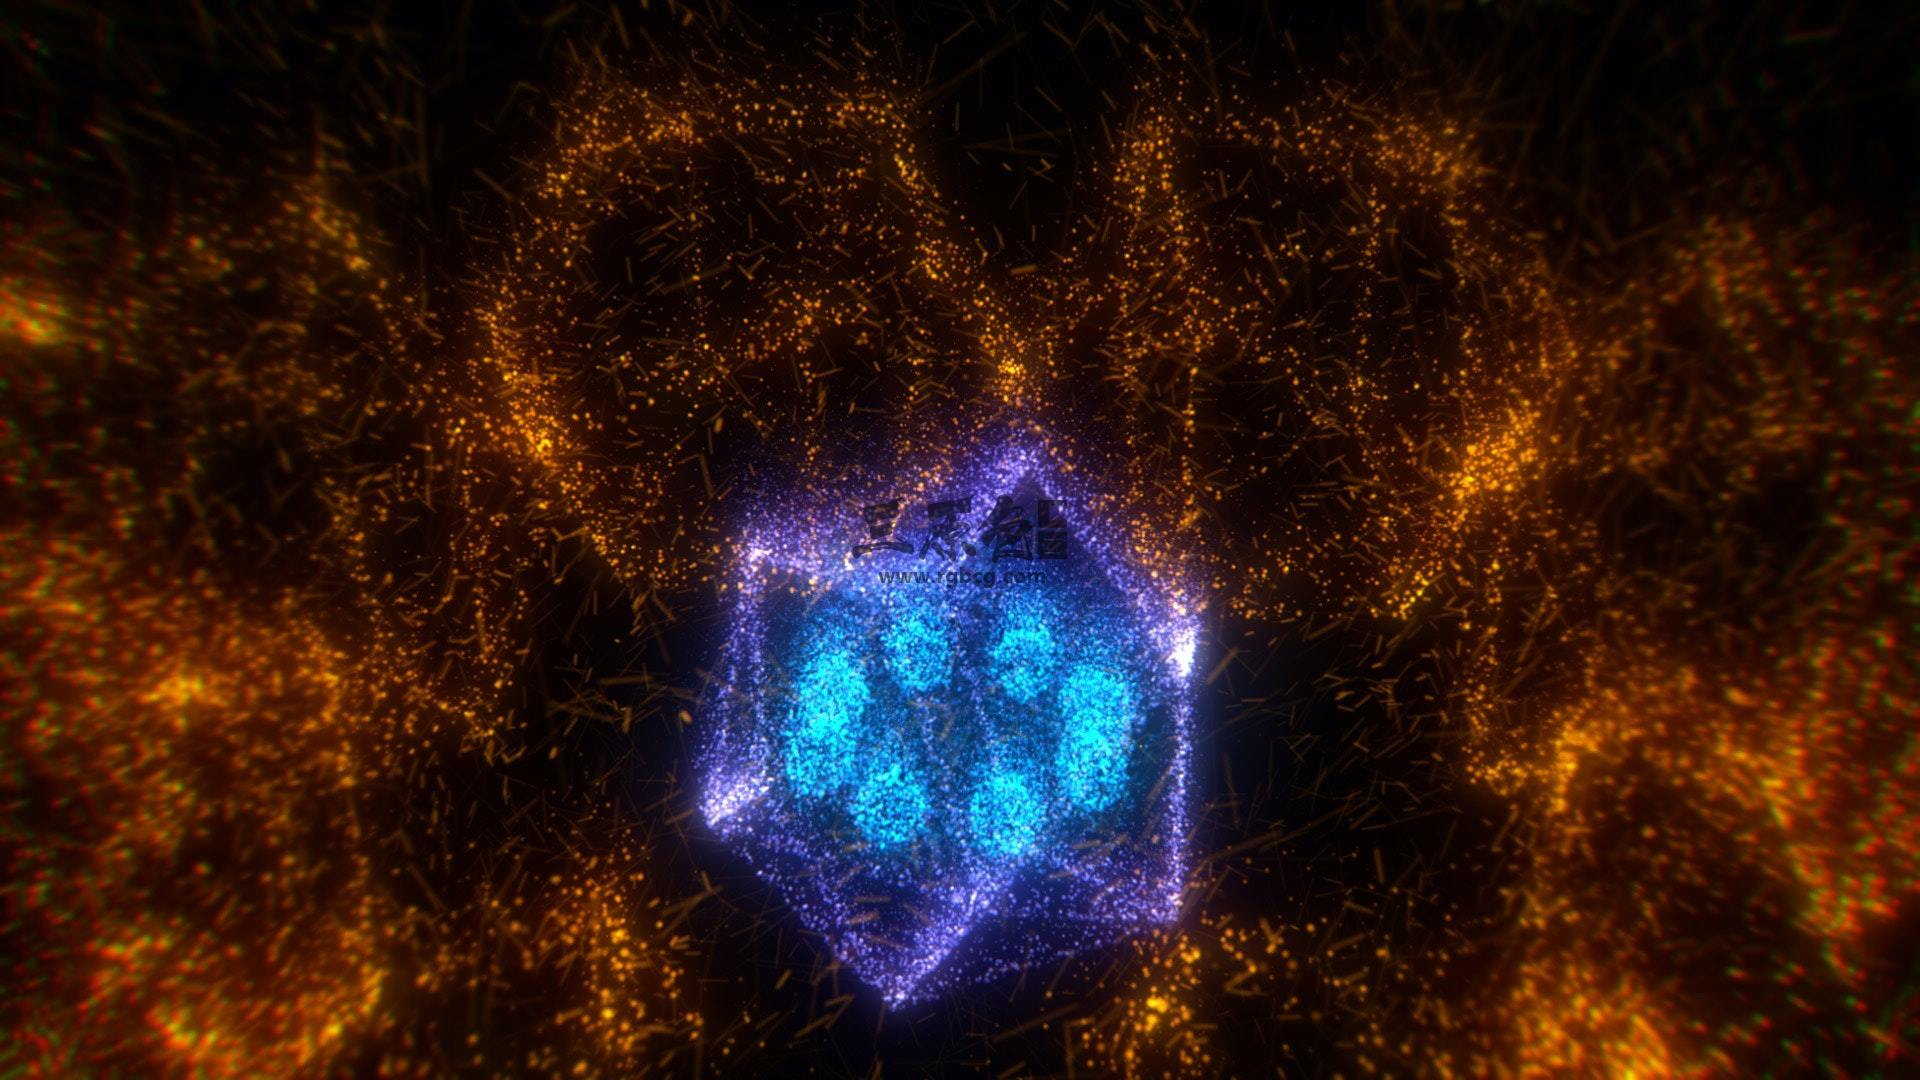 AE插件 3D粒子特效插件 Trapcode Particular v4 中英文 一键安装版 Ae 插件-第4张